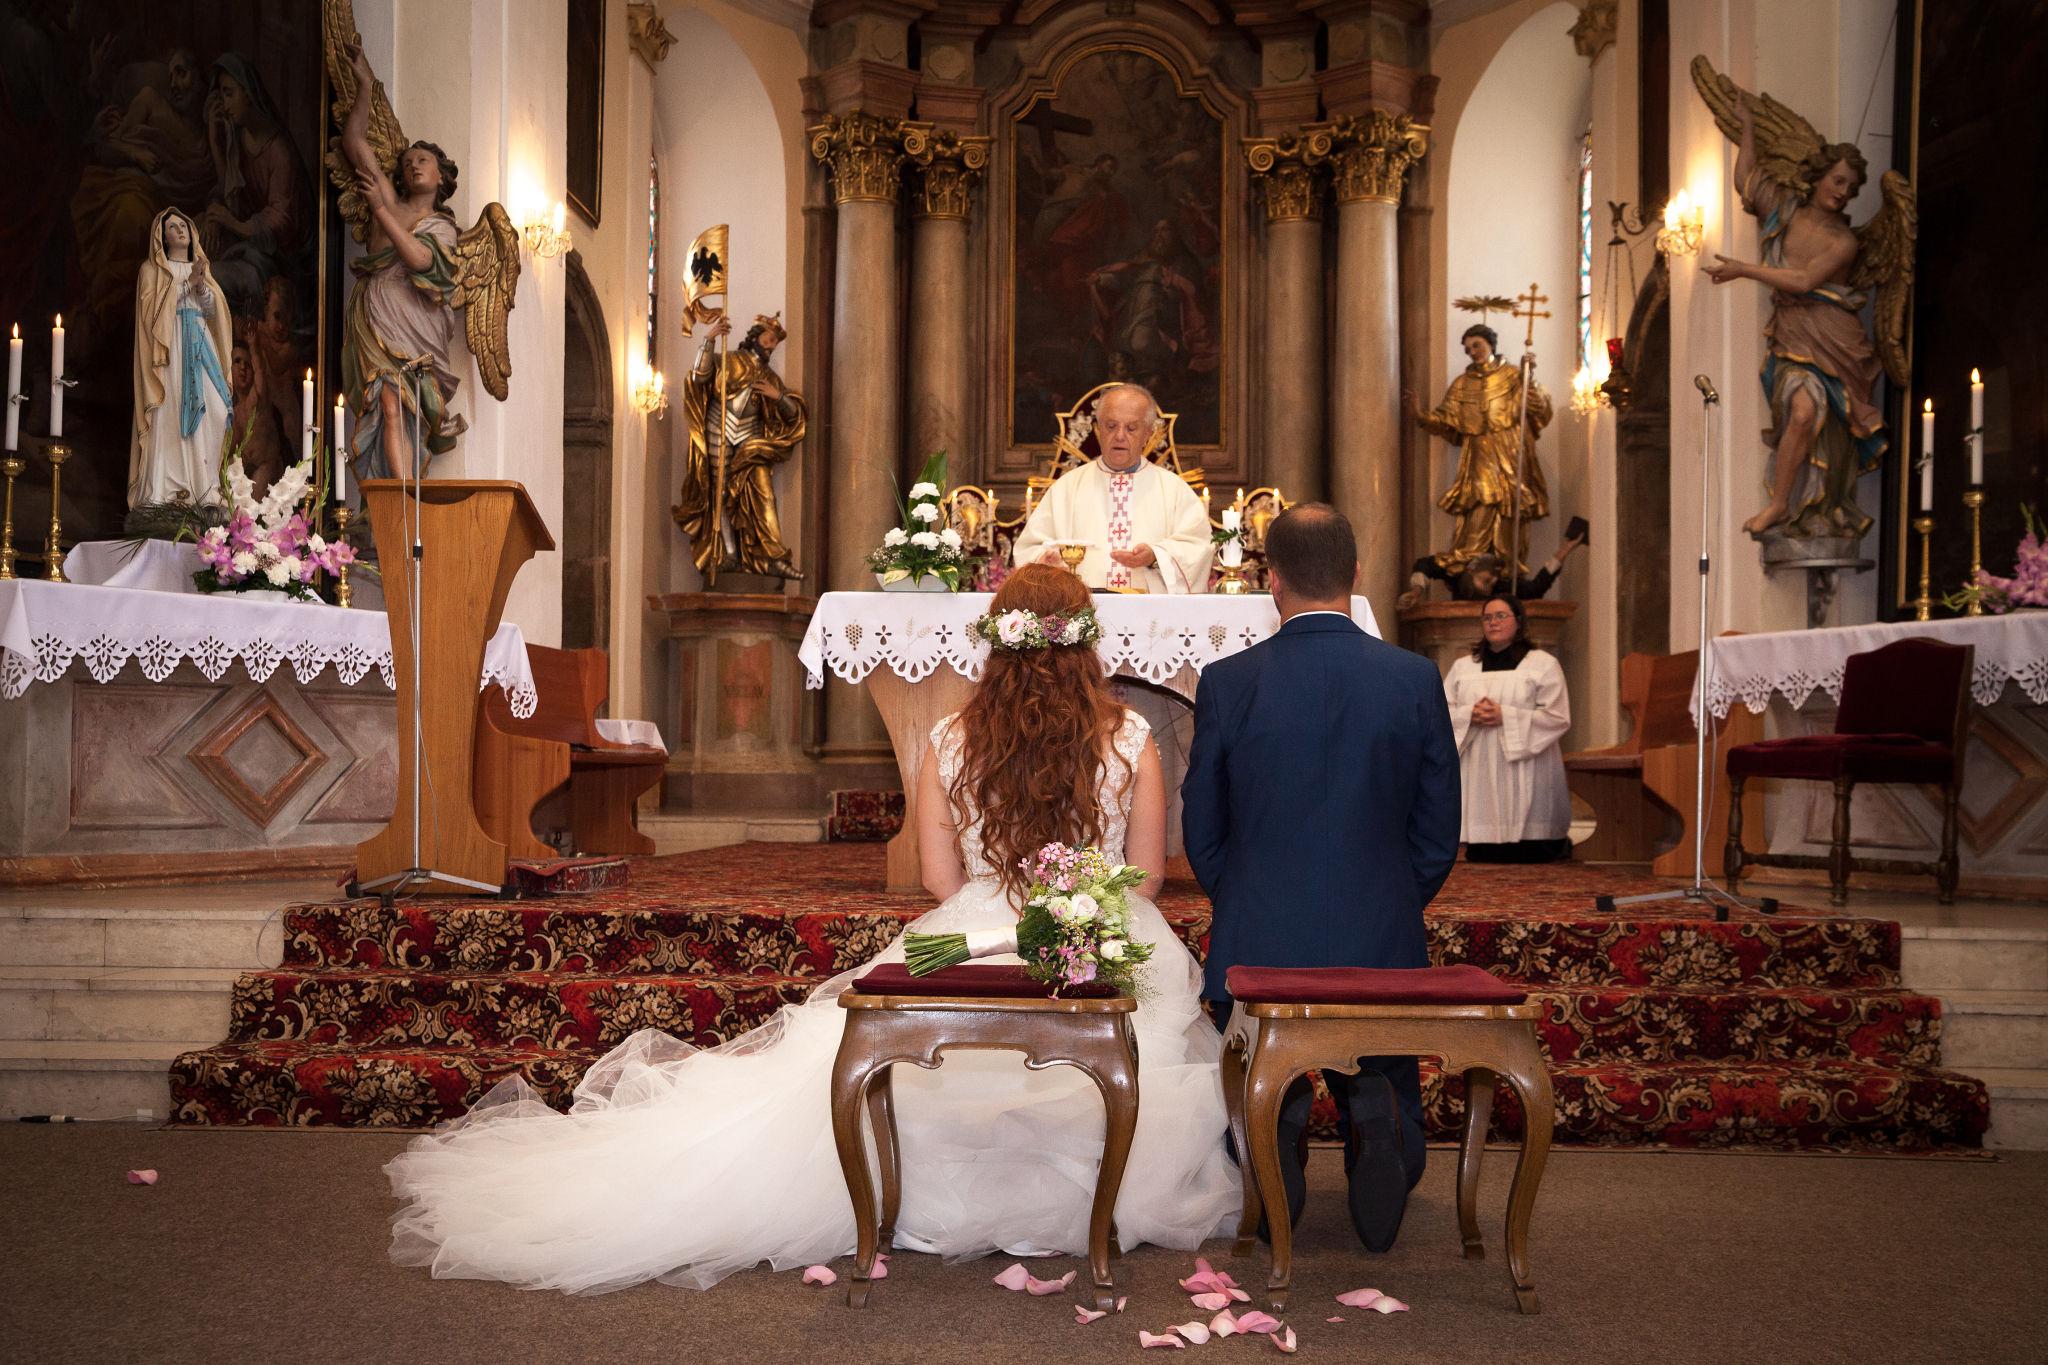 Svatba v kostele, fotograf Břetislav Válek